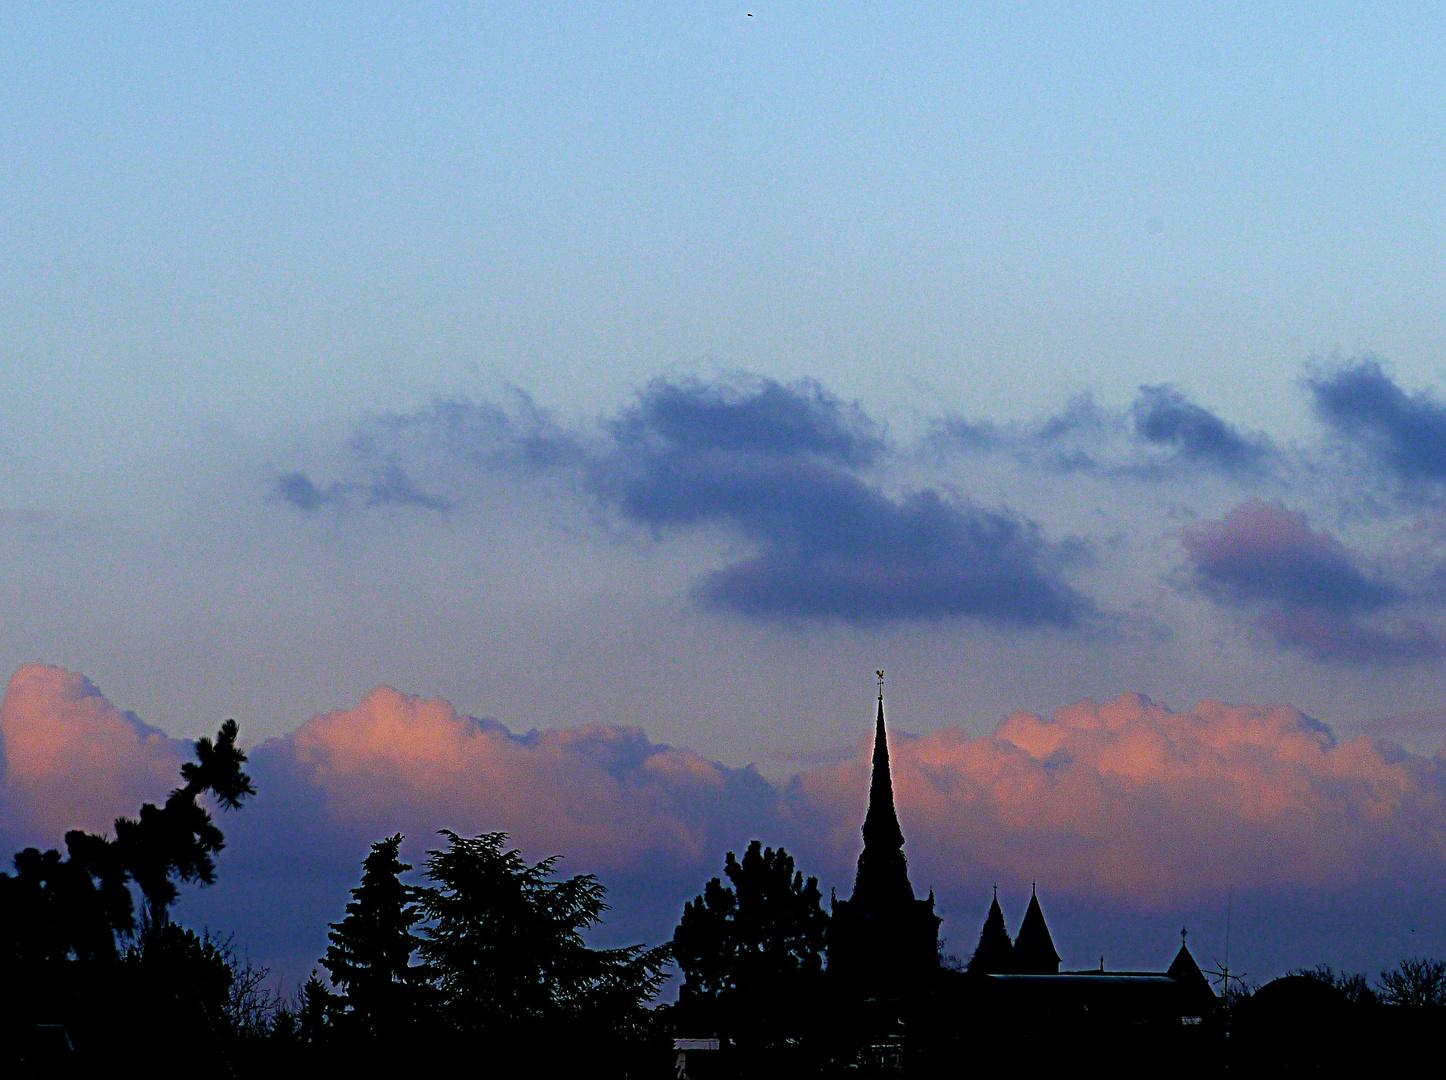 Abendwolken über St. Peter und Paul in Ratingen.